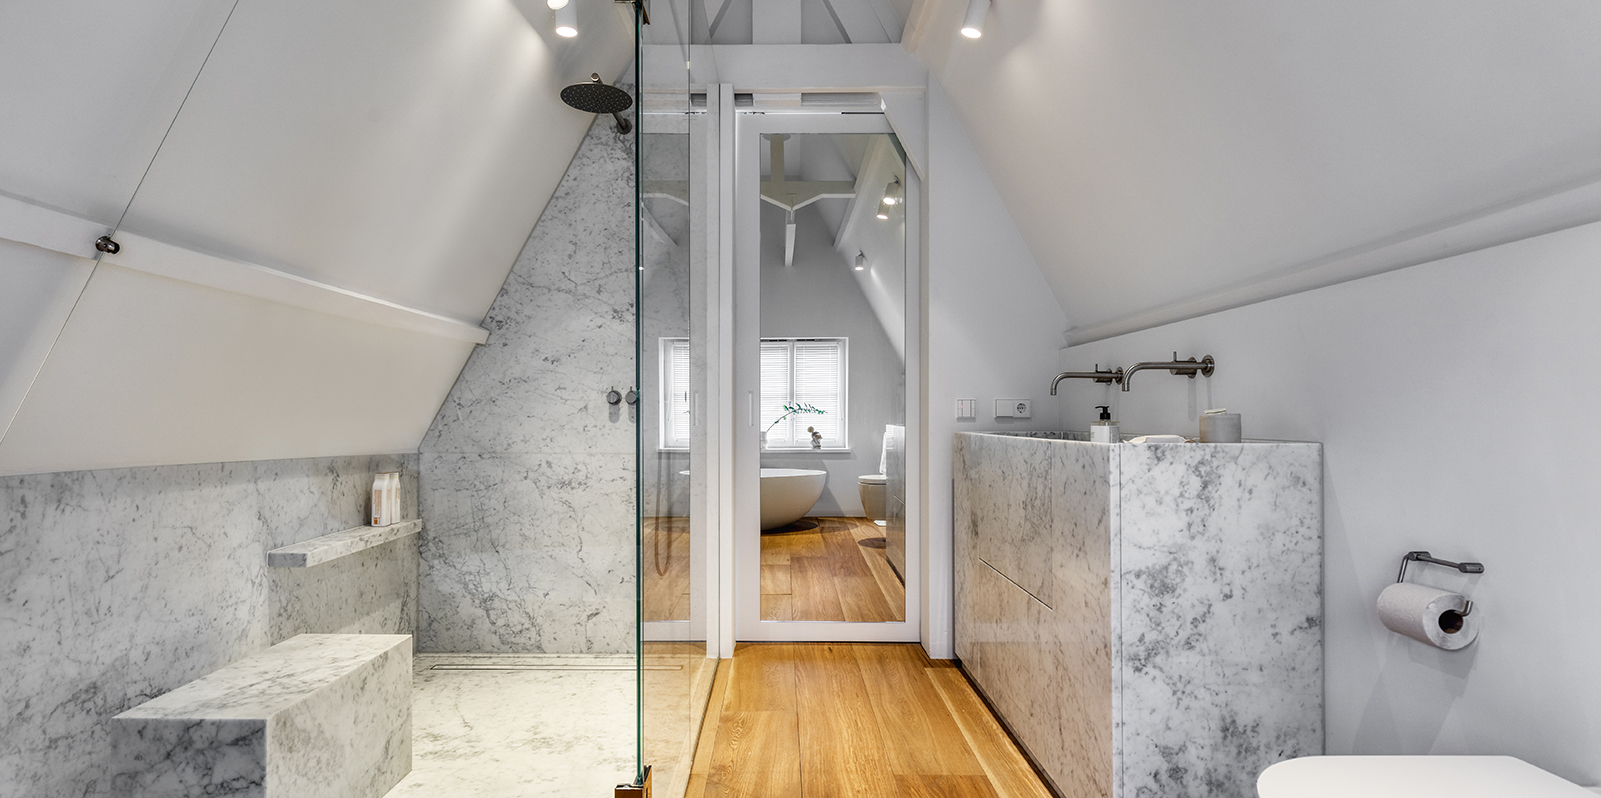 Vola, badkamerkranen, kranen, design